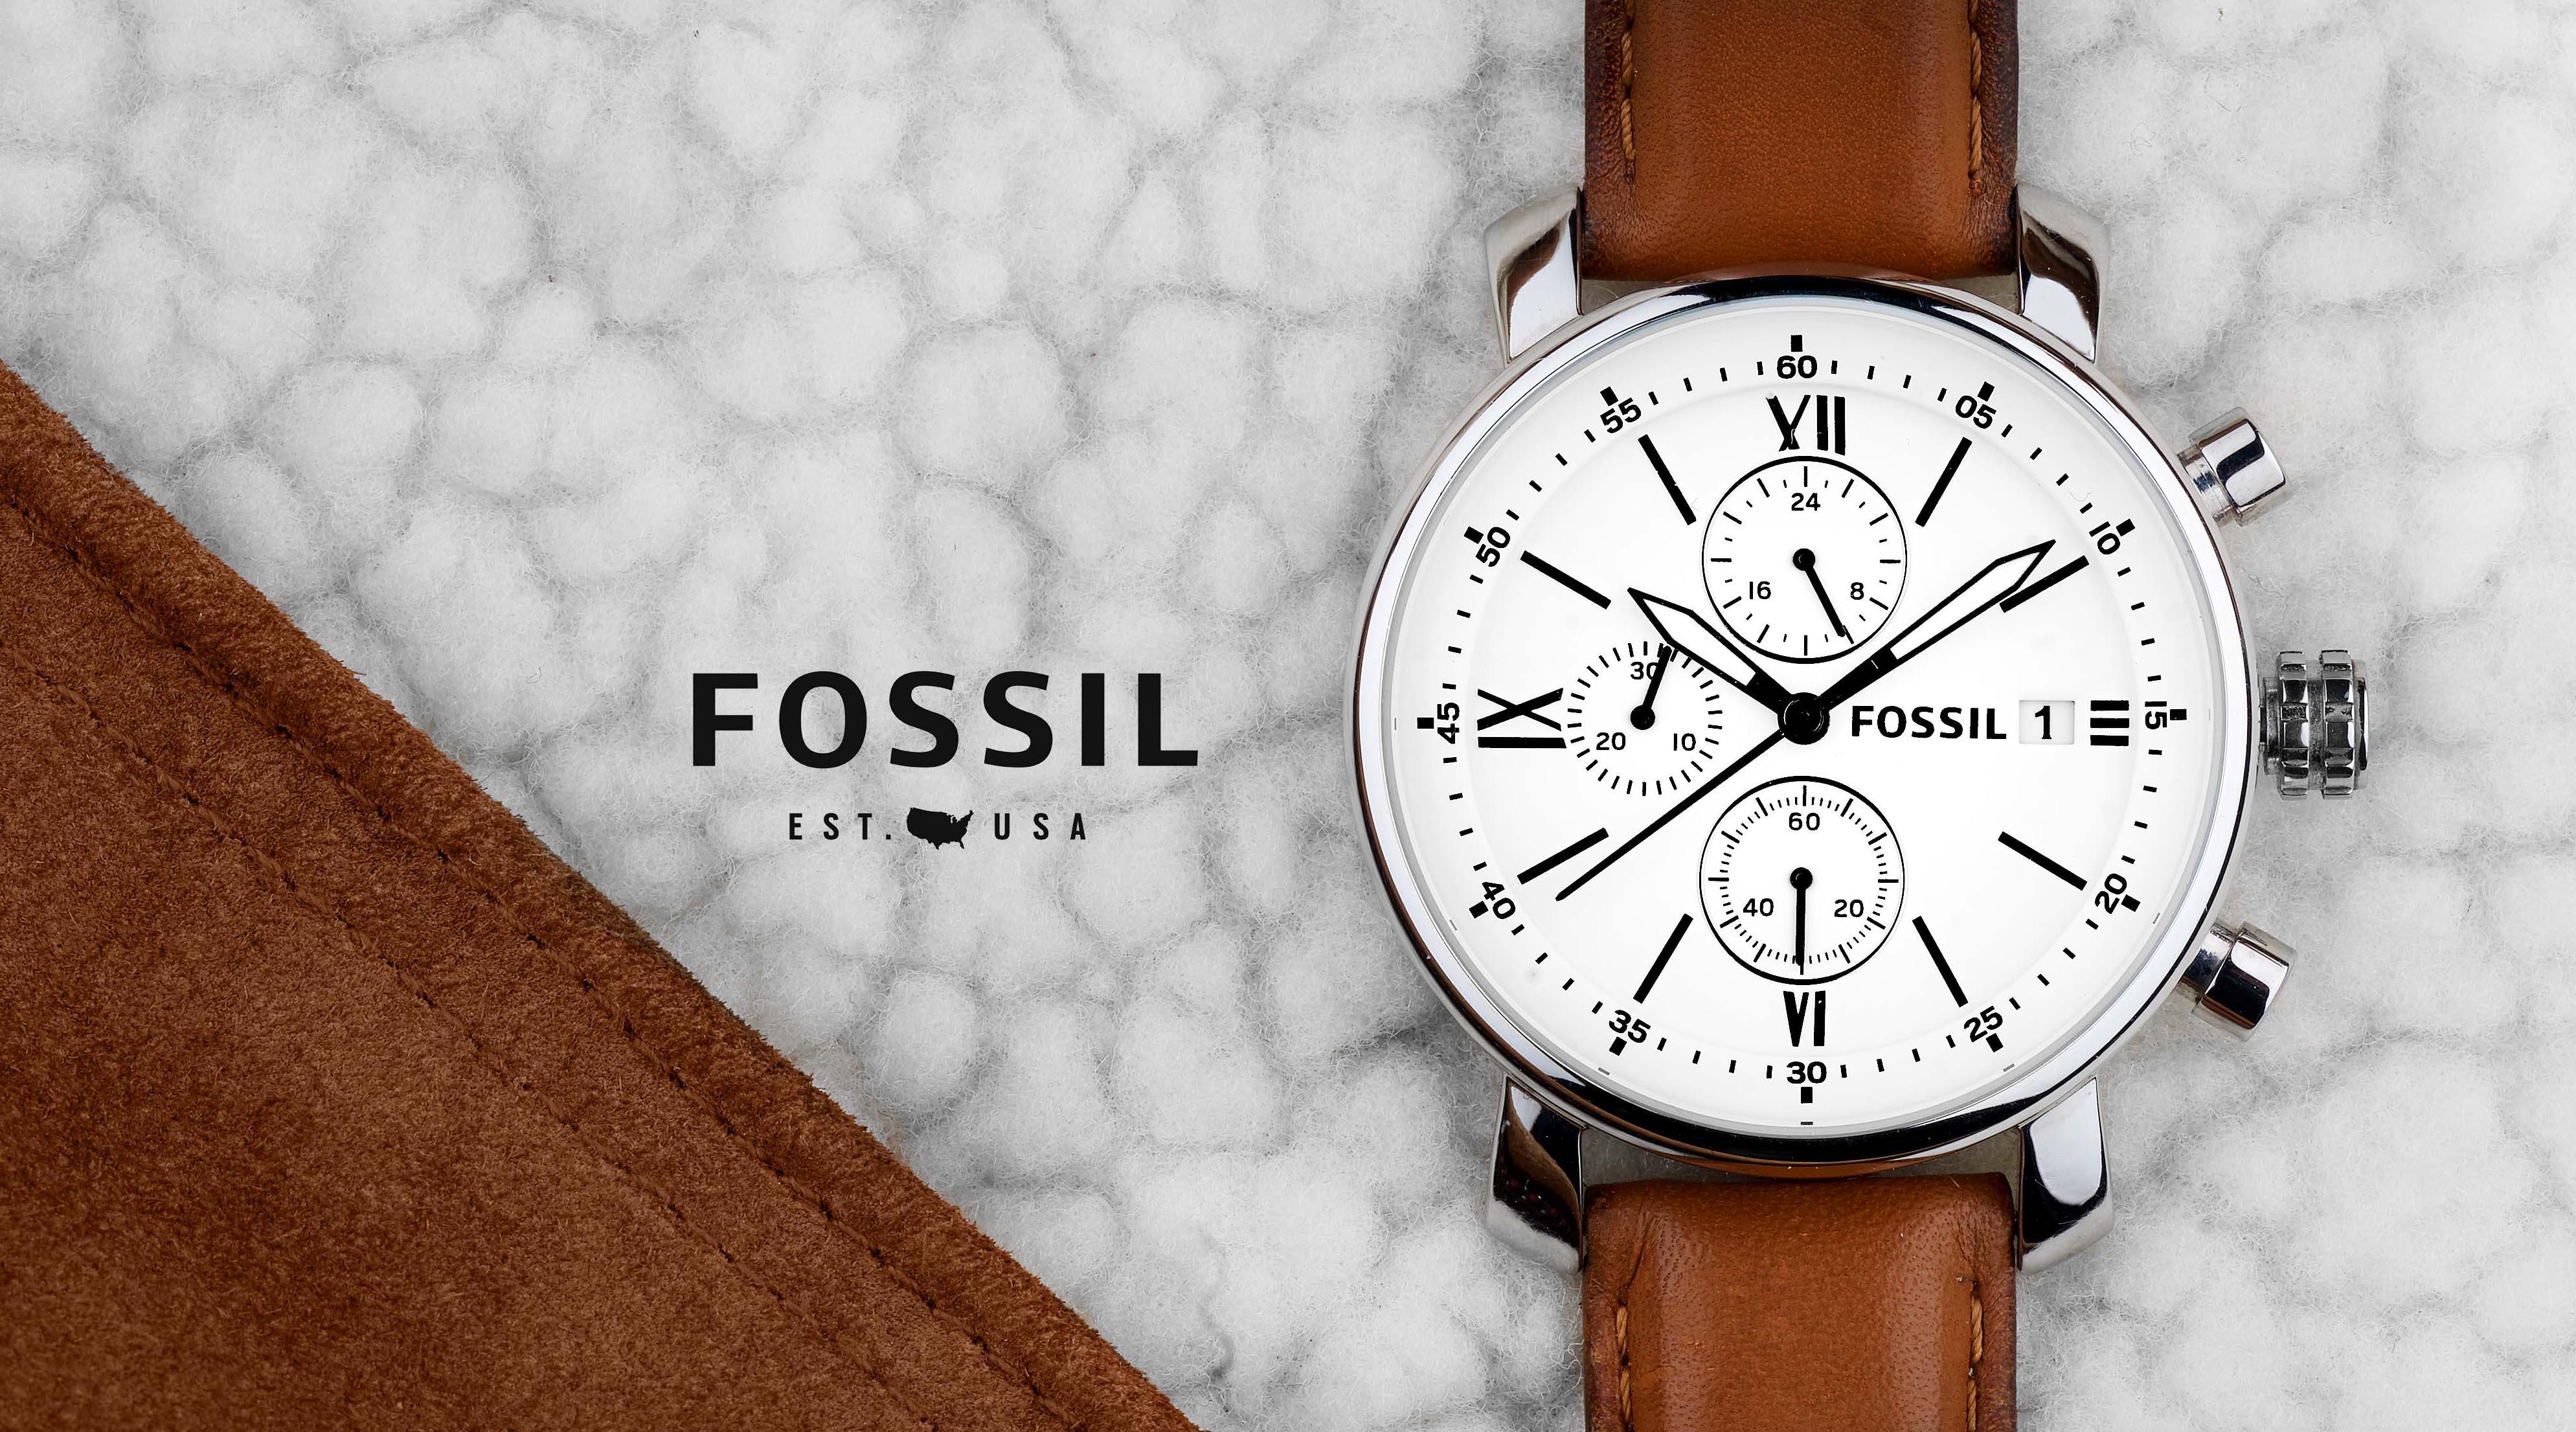 fossil 1 copy